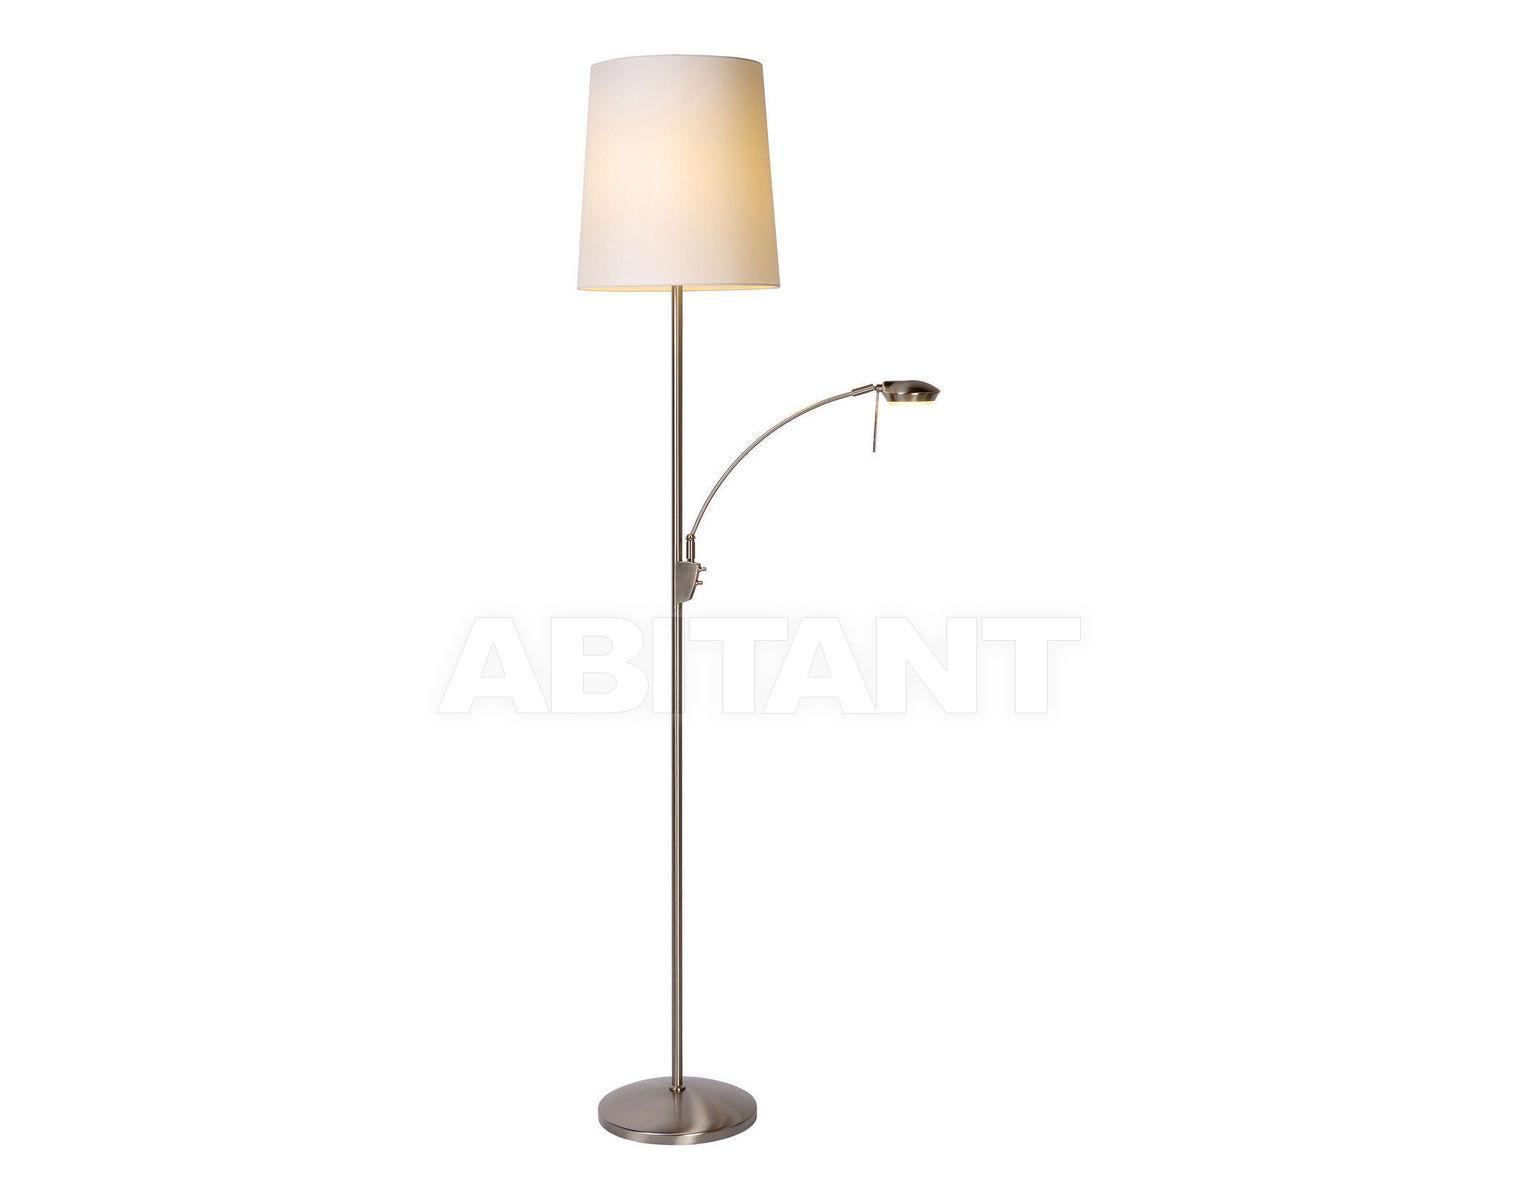 Купить Торшер PEGGY Lucide  Floor & Table Lamps 39705/03/31